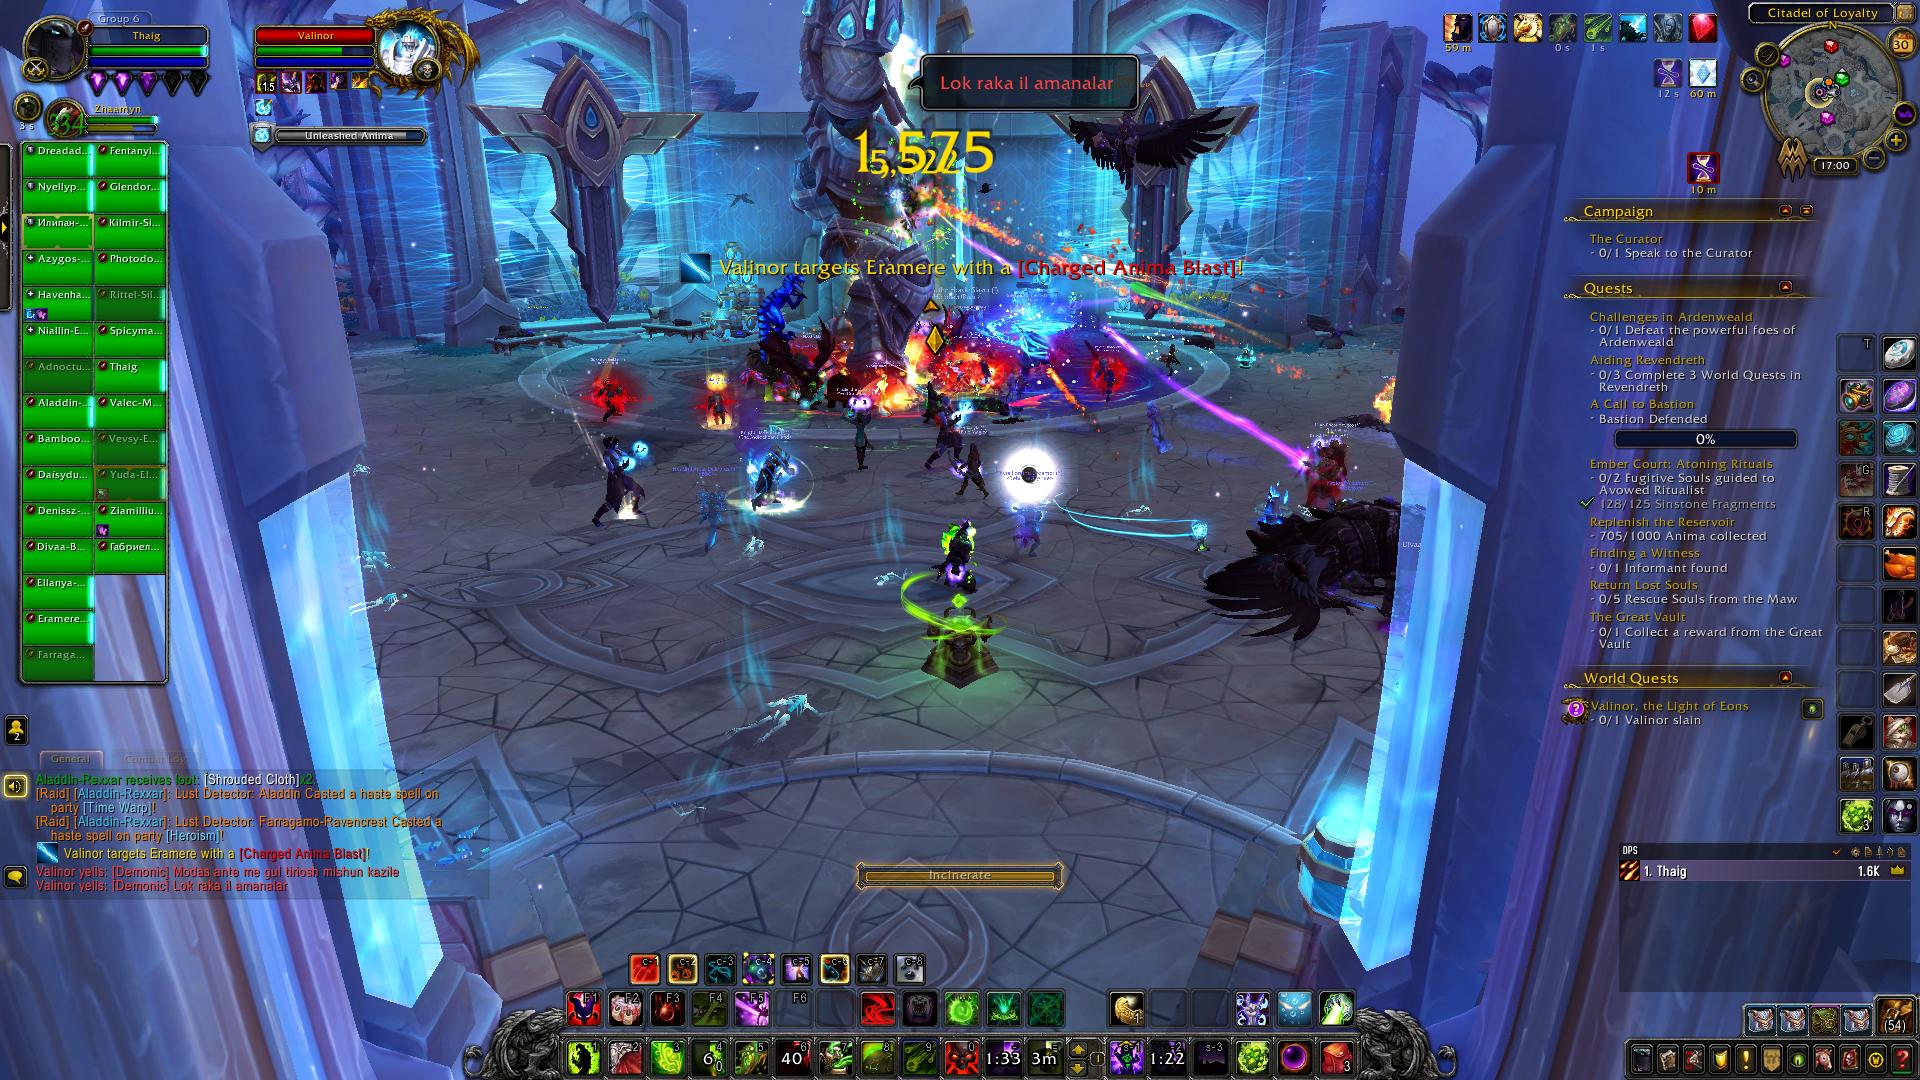 World of Warcraft: Shadowlands - endgame